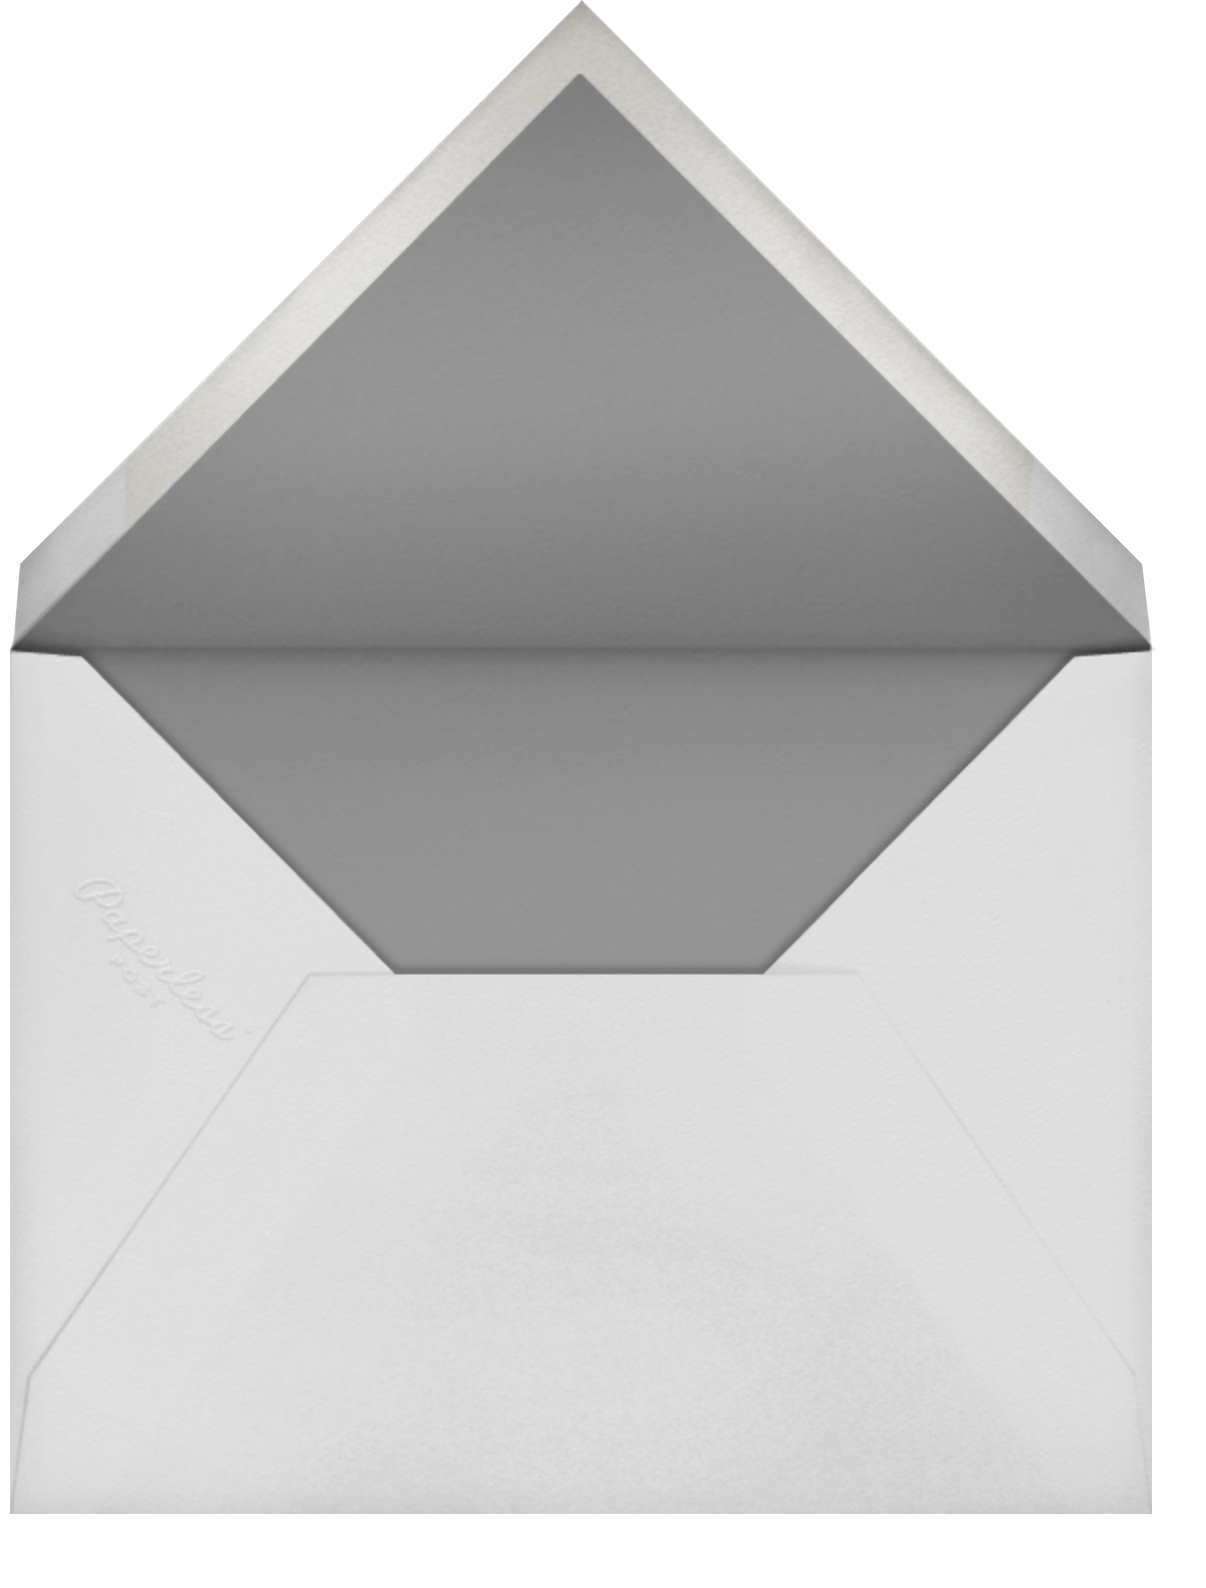 Custom (Square) - Paperless Post - Adult birthday - envelope back